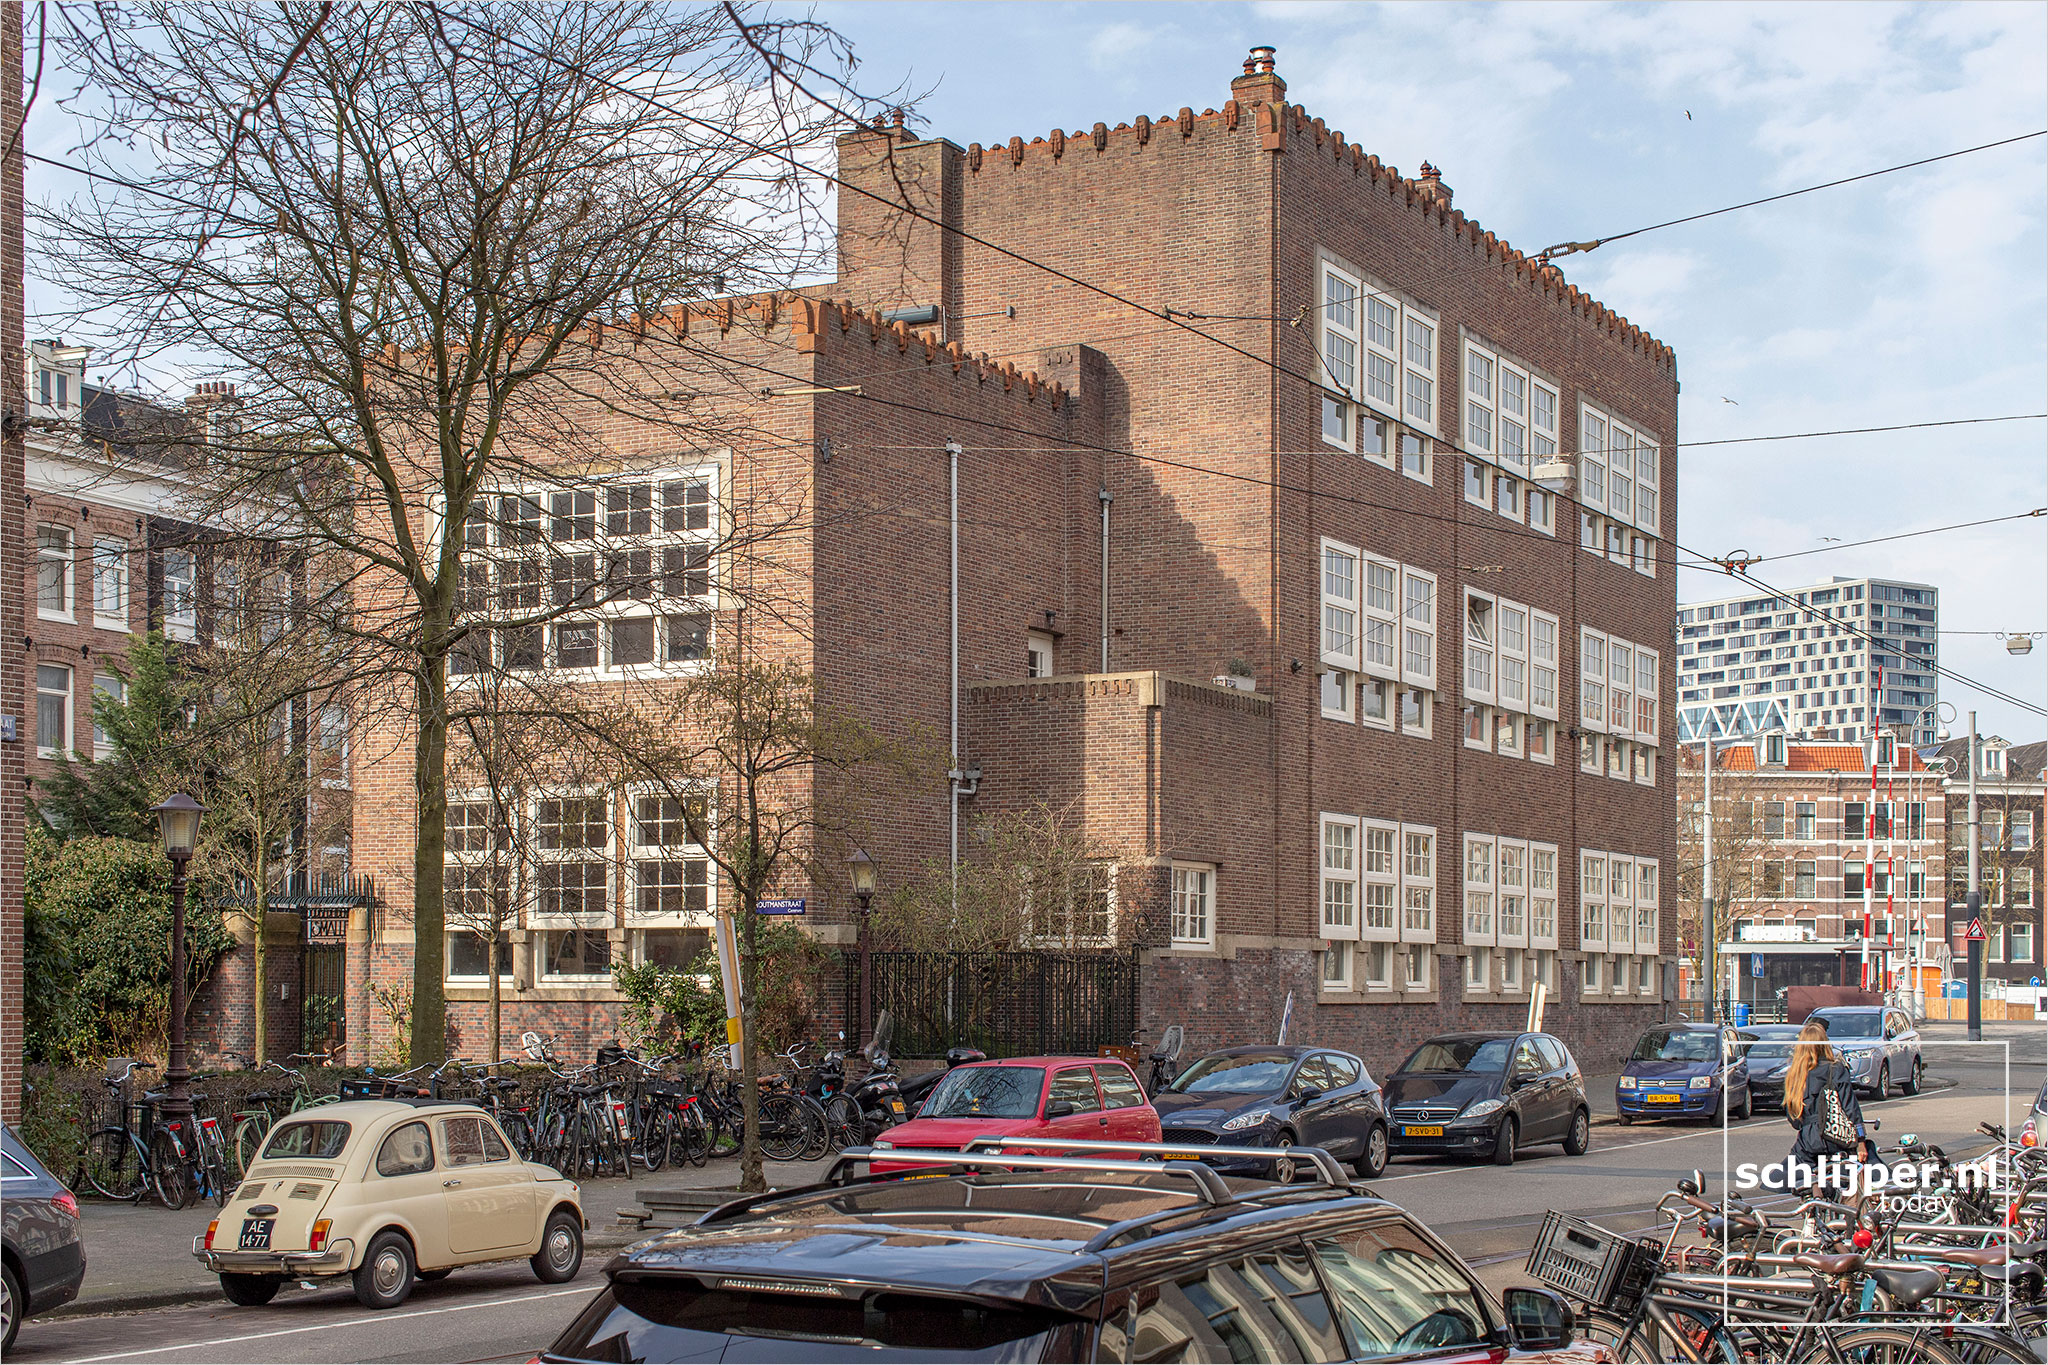 The Netherlands, Amsterdam, 24 maart 2021